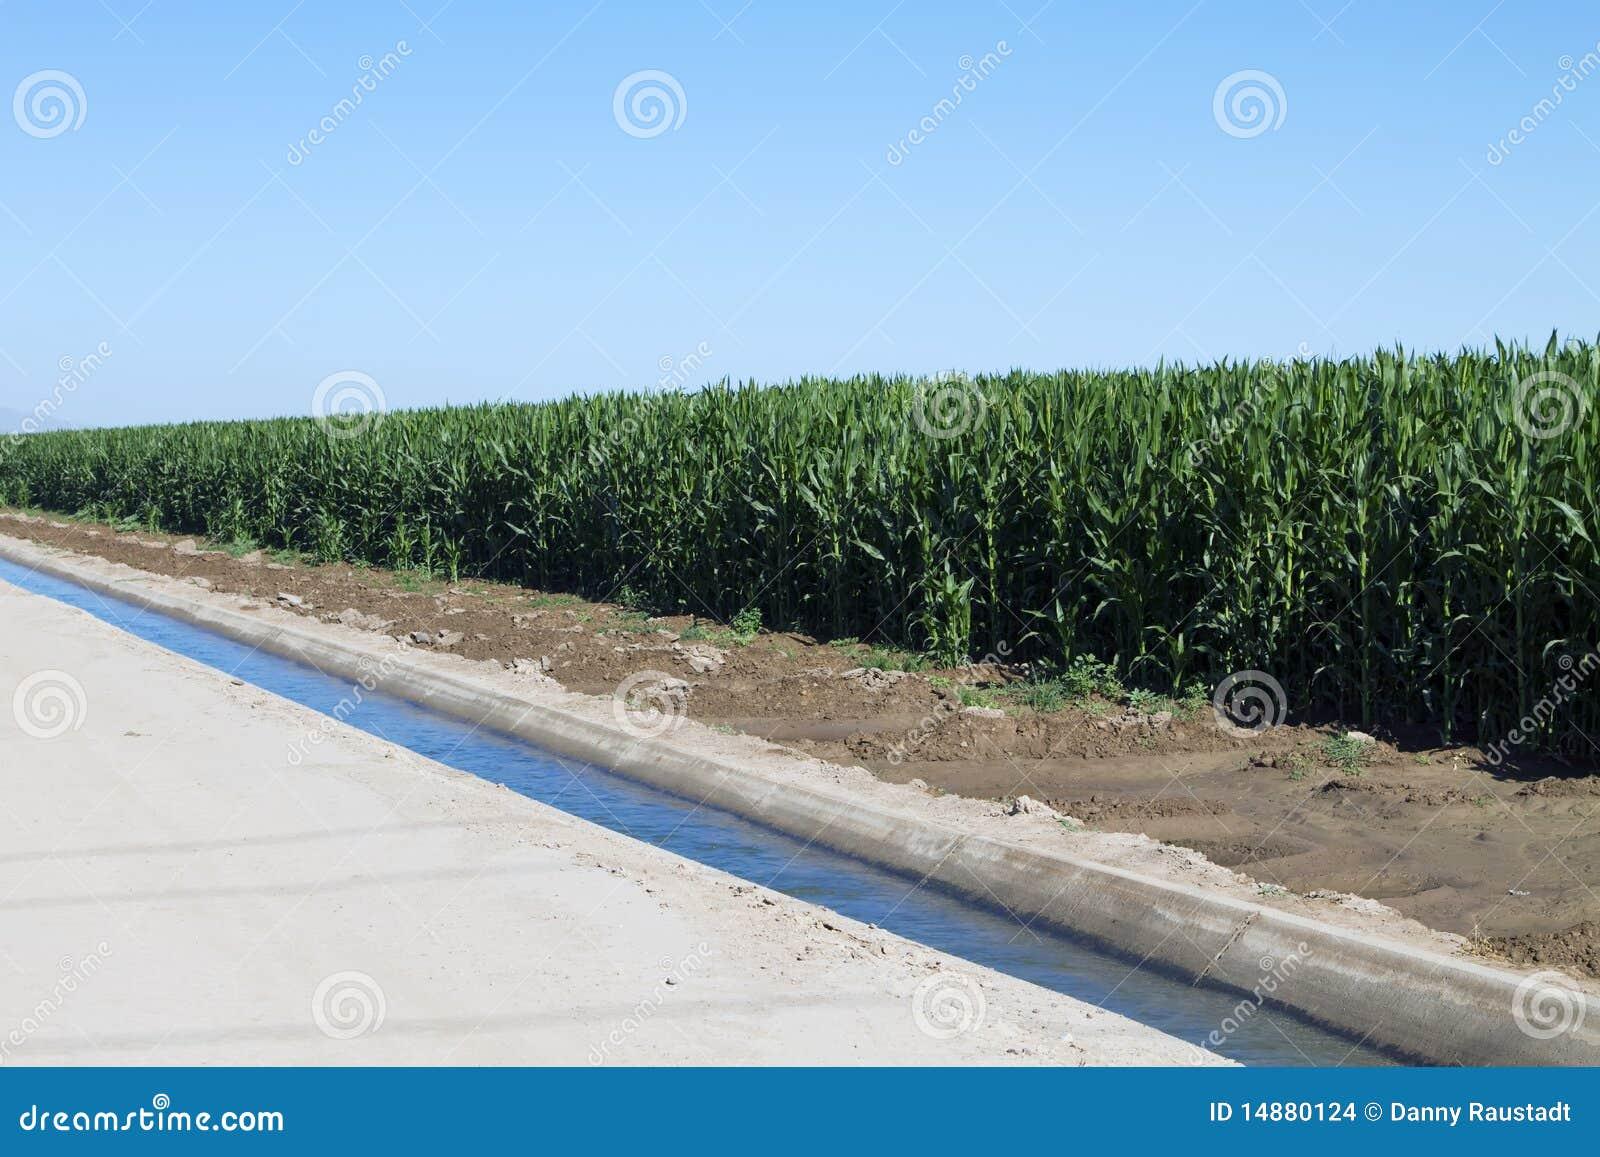 Agricultural Irrigation Canal : Desert farming agriculture irrigation canal stock photo